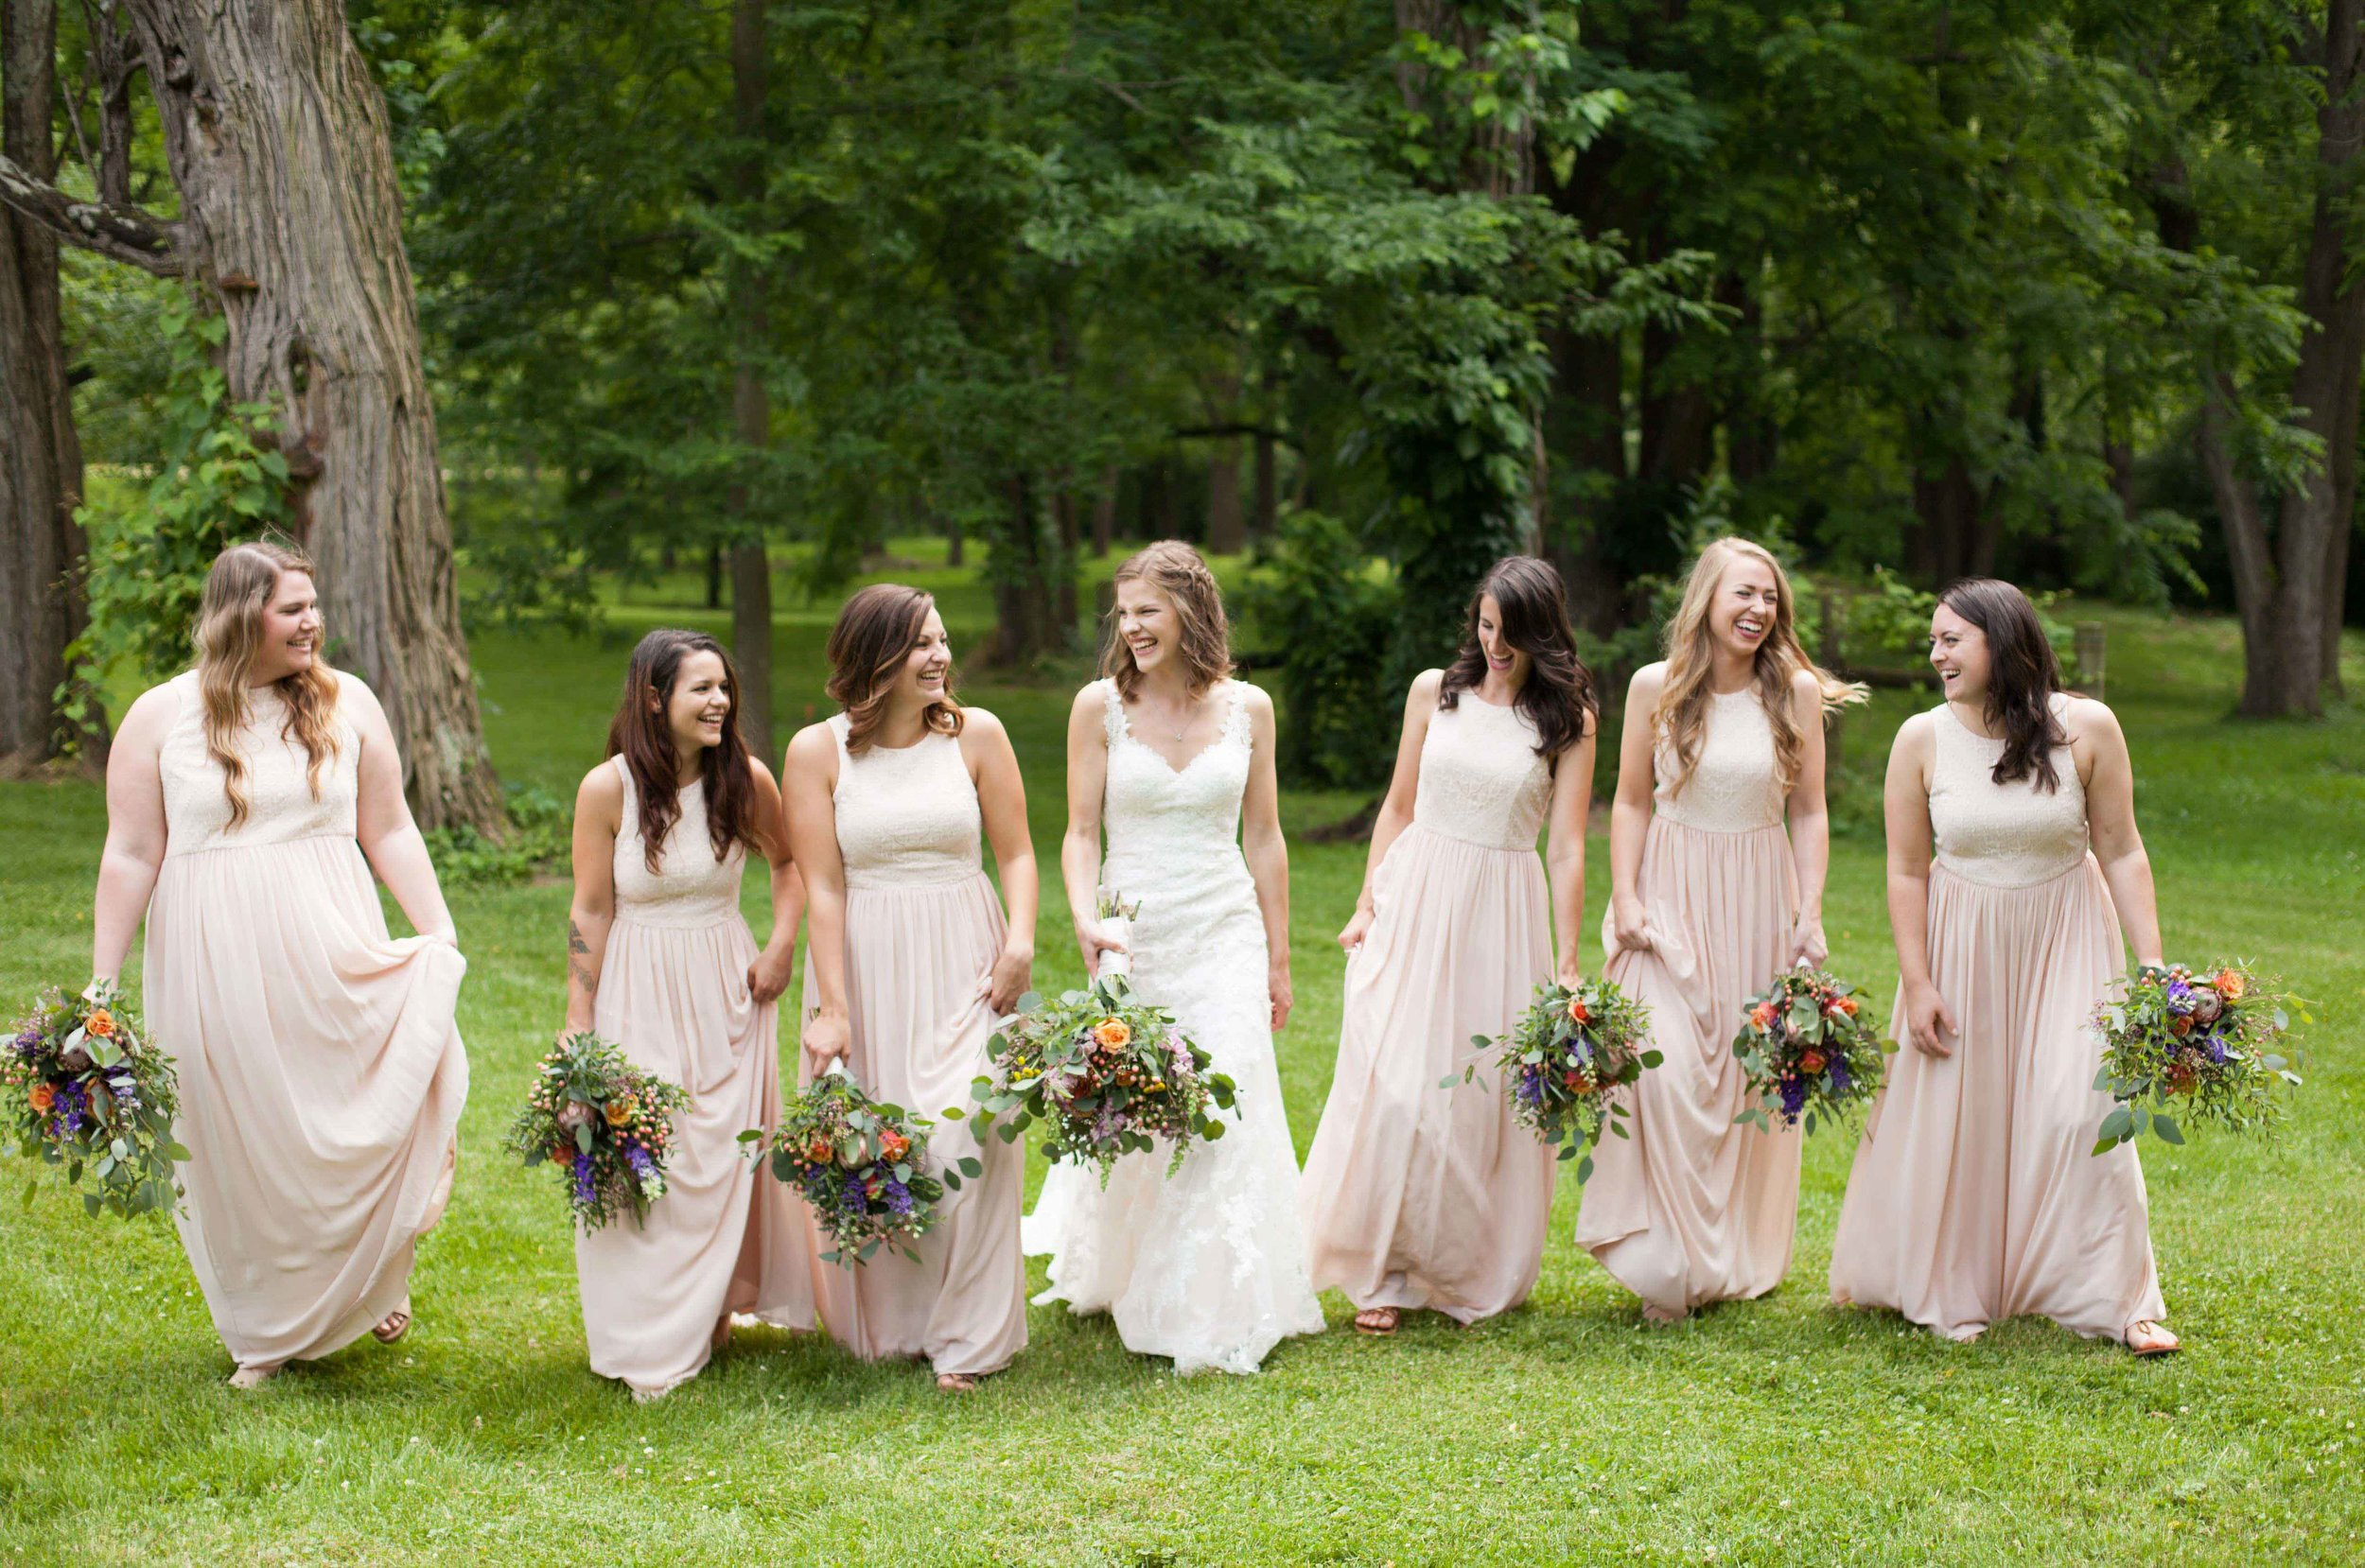 bb cincinnati wedding photographer girls0002.jpg